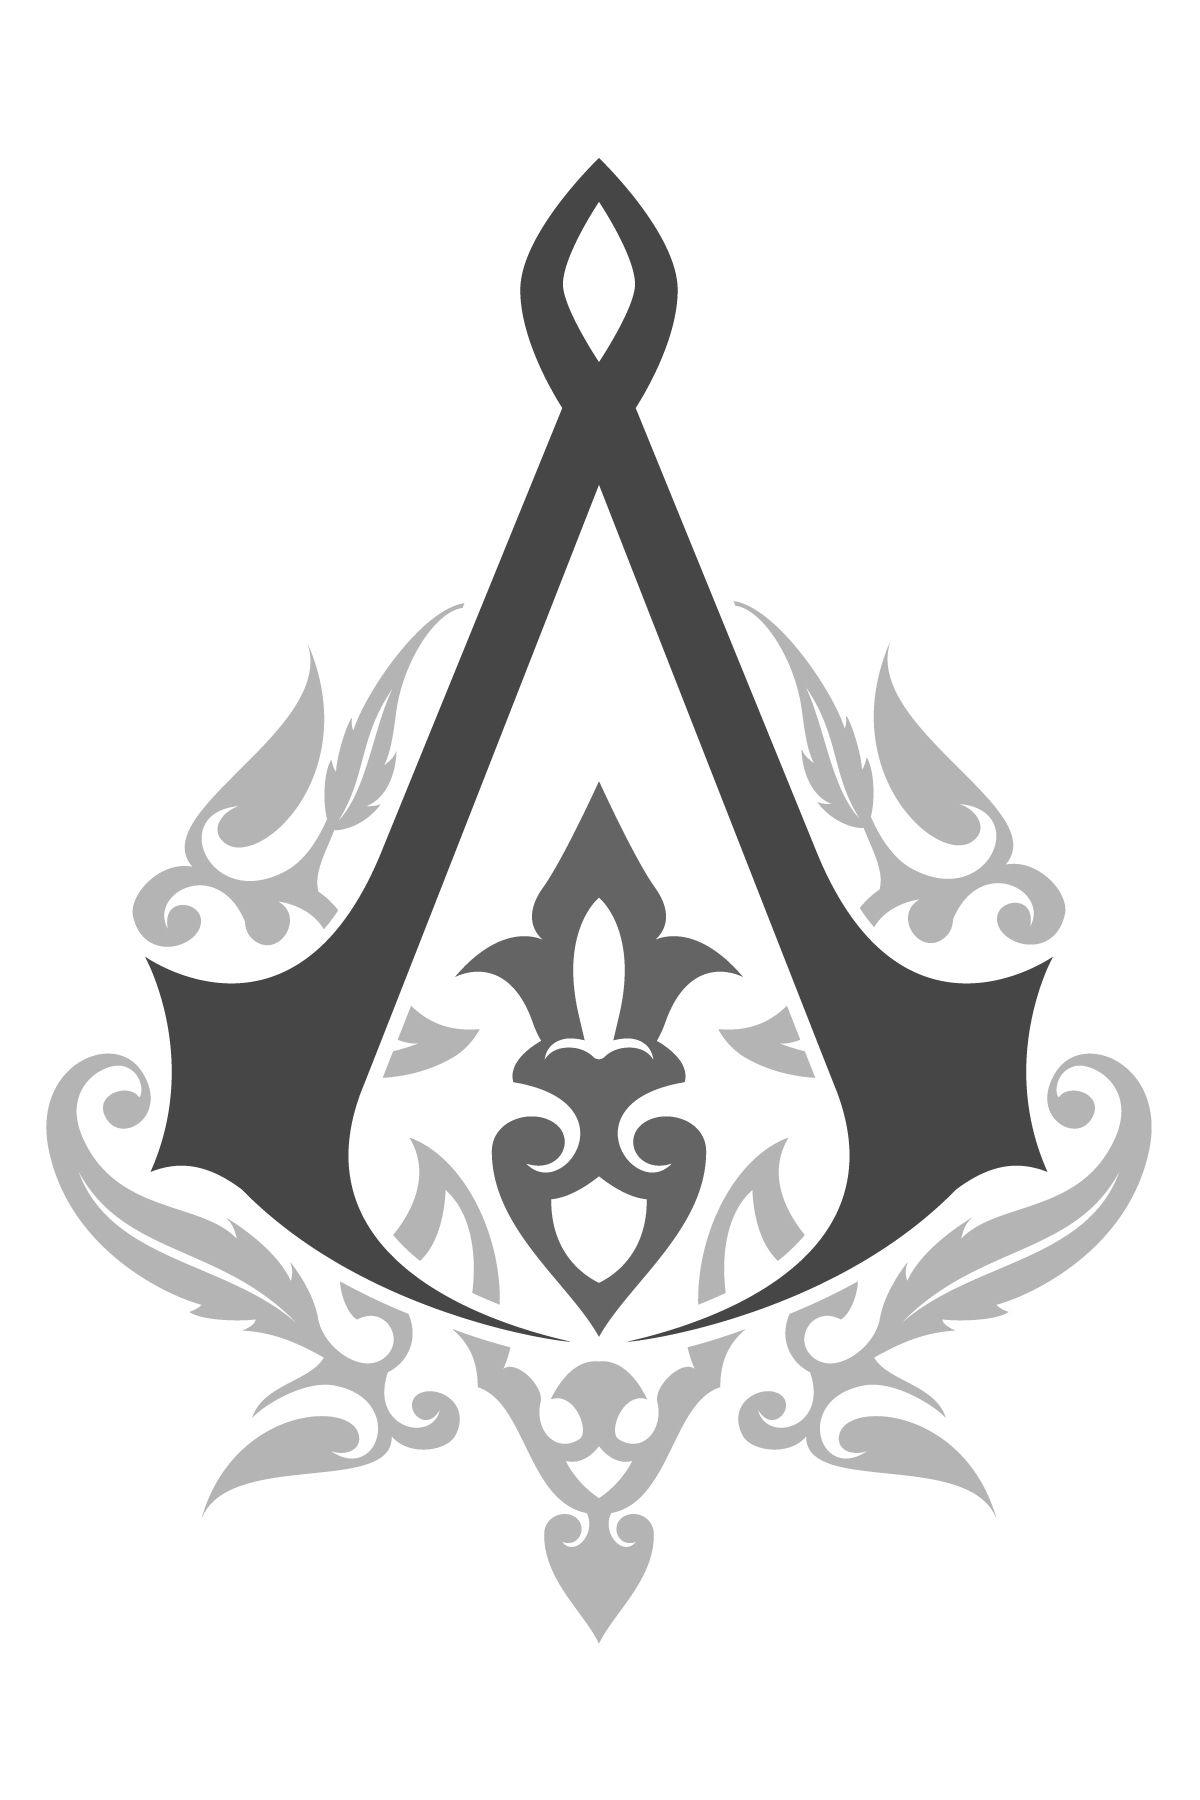 Assassin S Smybol Assassins Creed Art Assassins Creed Artwork